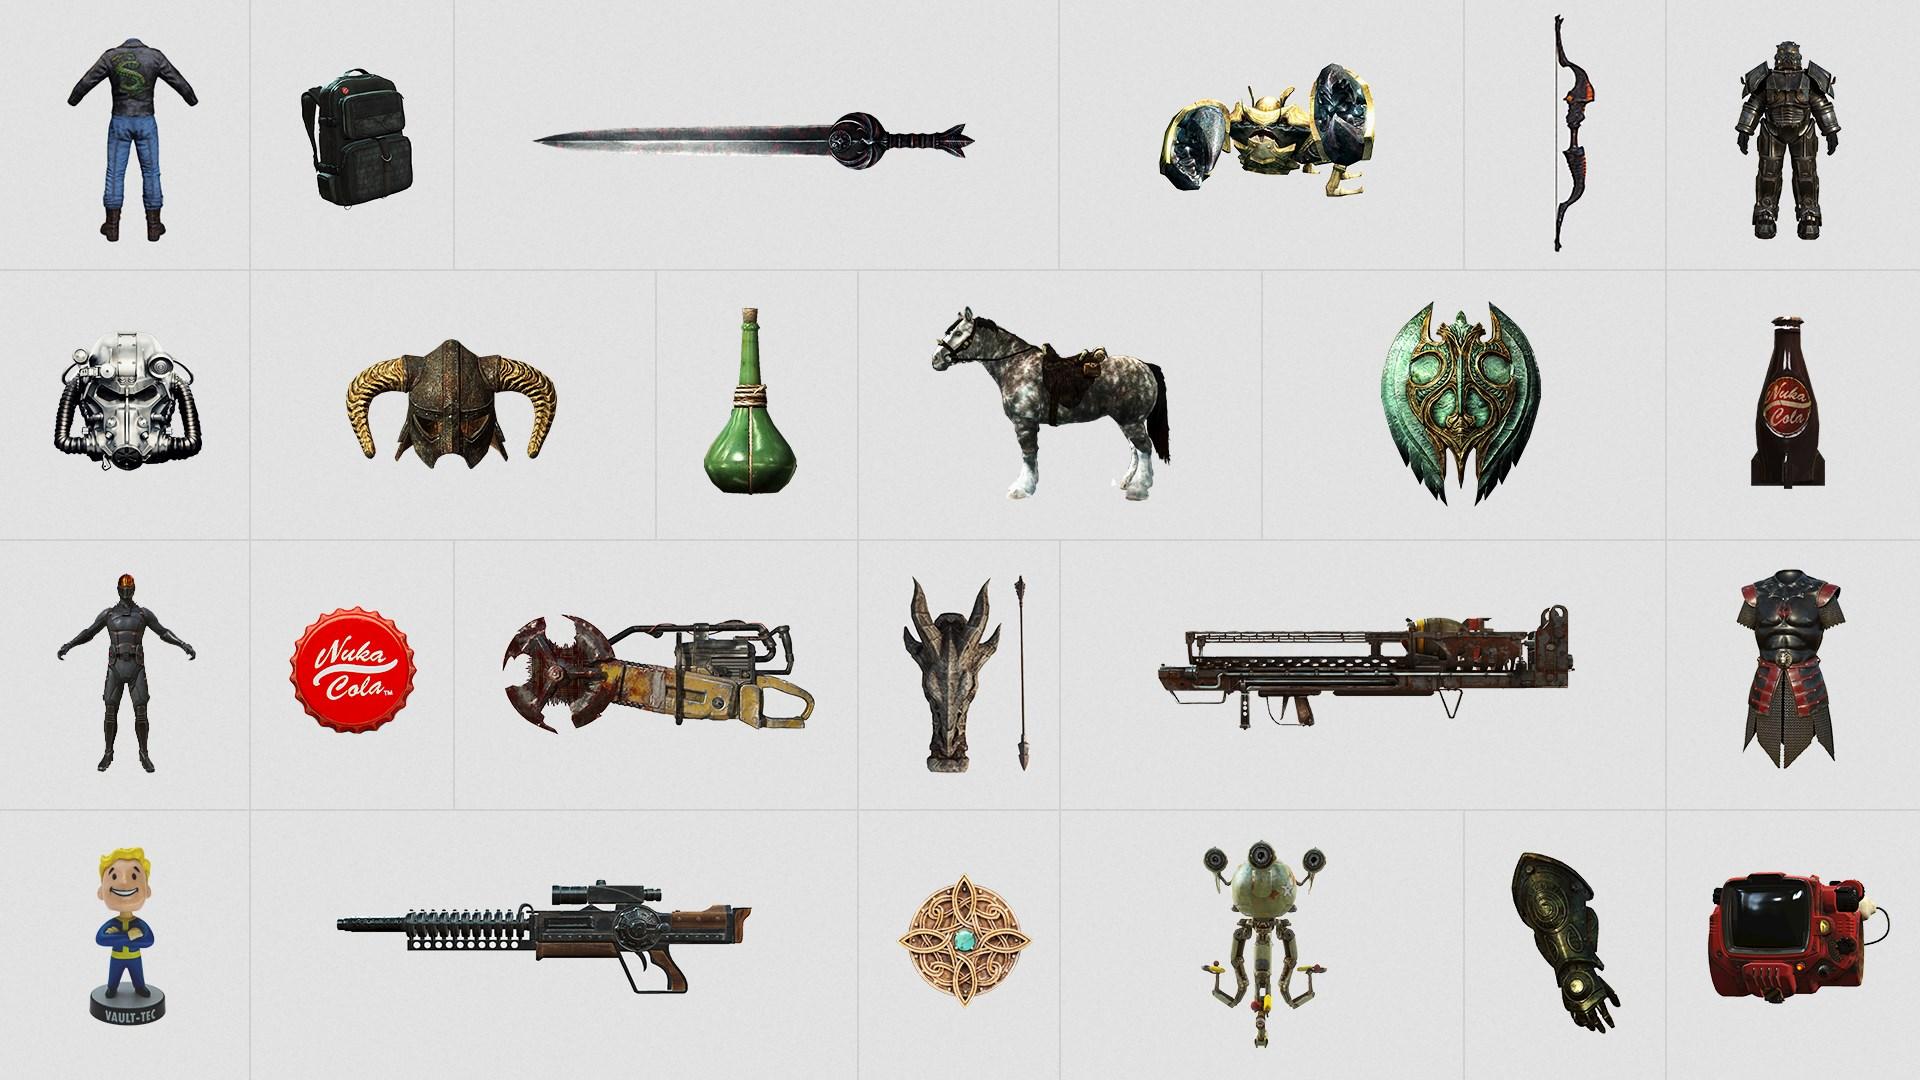 Fallout 4 Creation Club: 3000 Credits